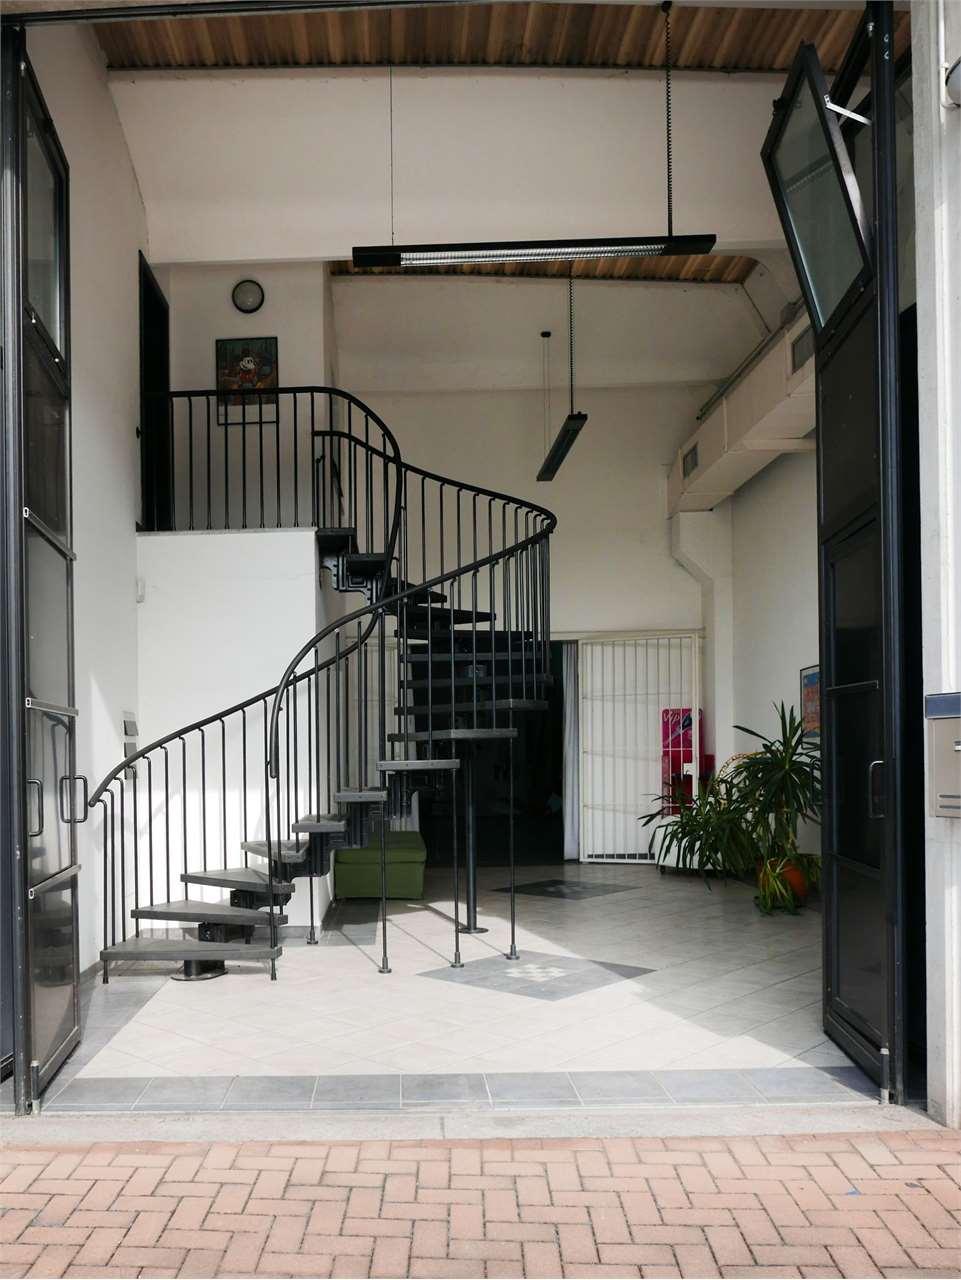 Vendita Laboratorio Commerciale/Industriale Cocquio-Trevisago via appenini 10 227558